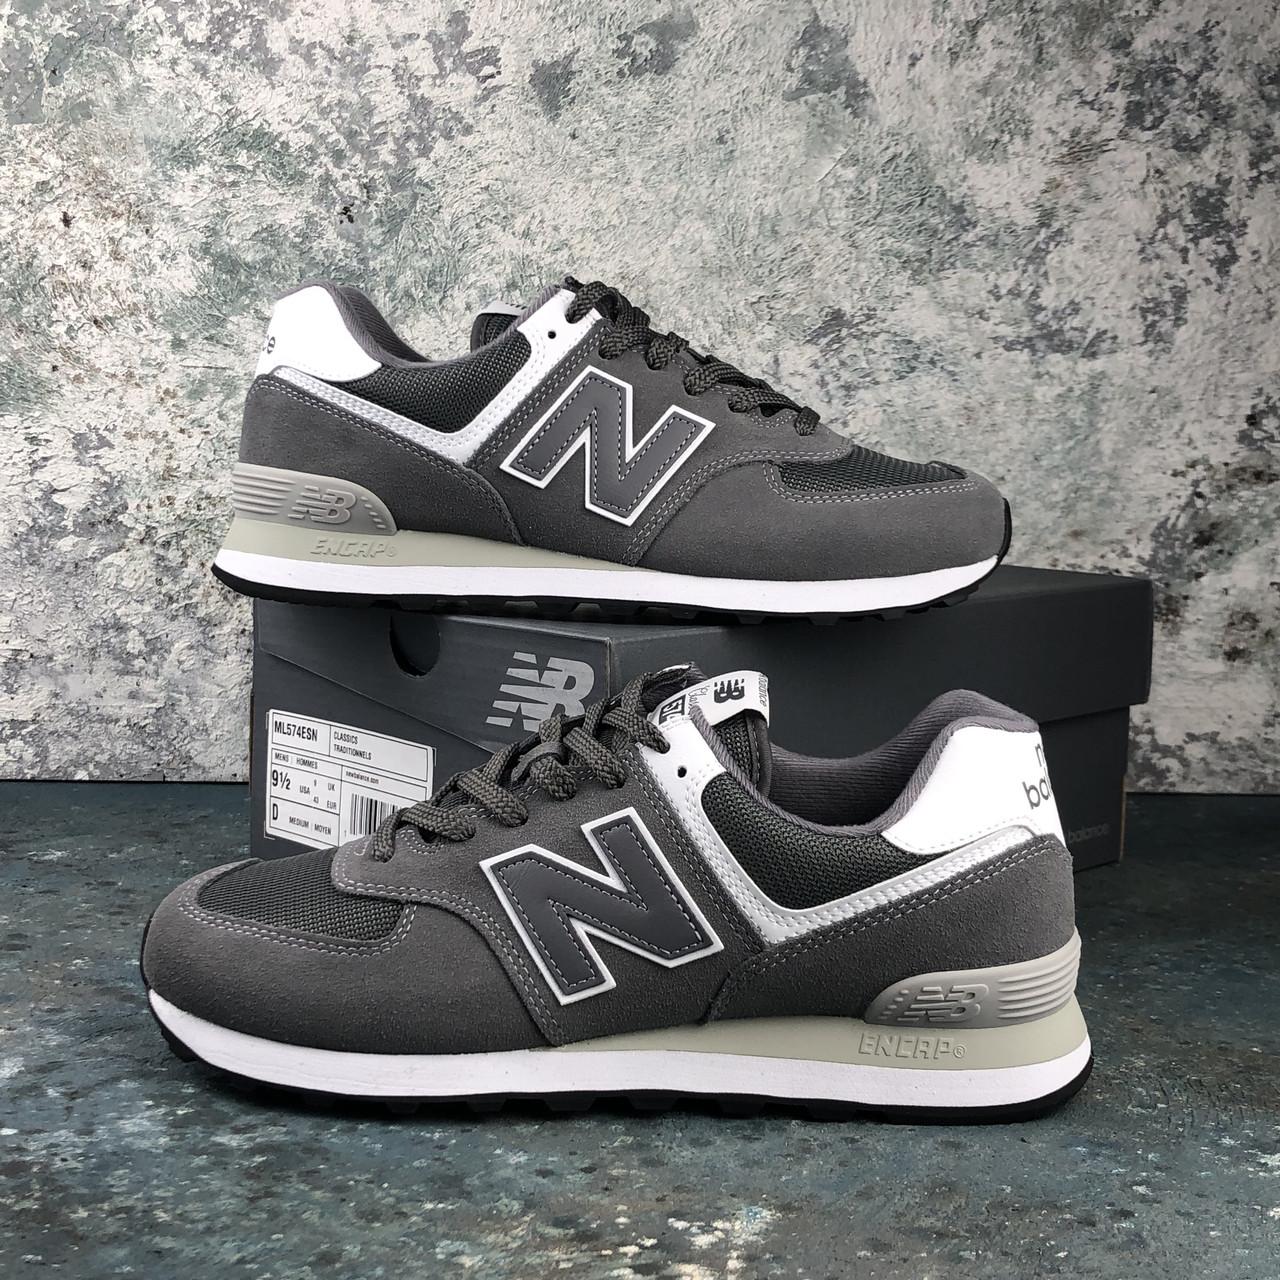 Мужские кроссовки New Balance 574 Grey ML574ESN. Оригинал. Замша. Подошва резина